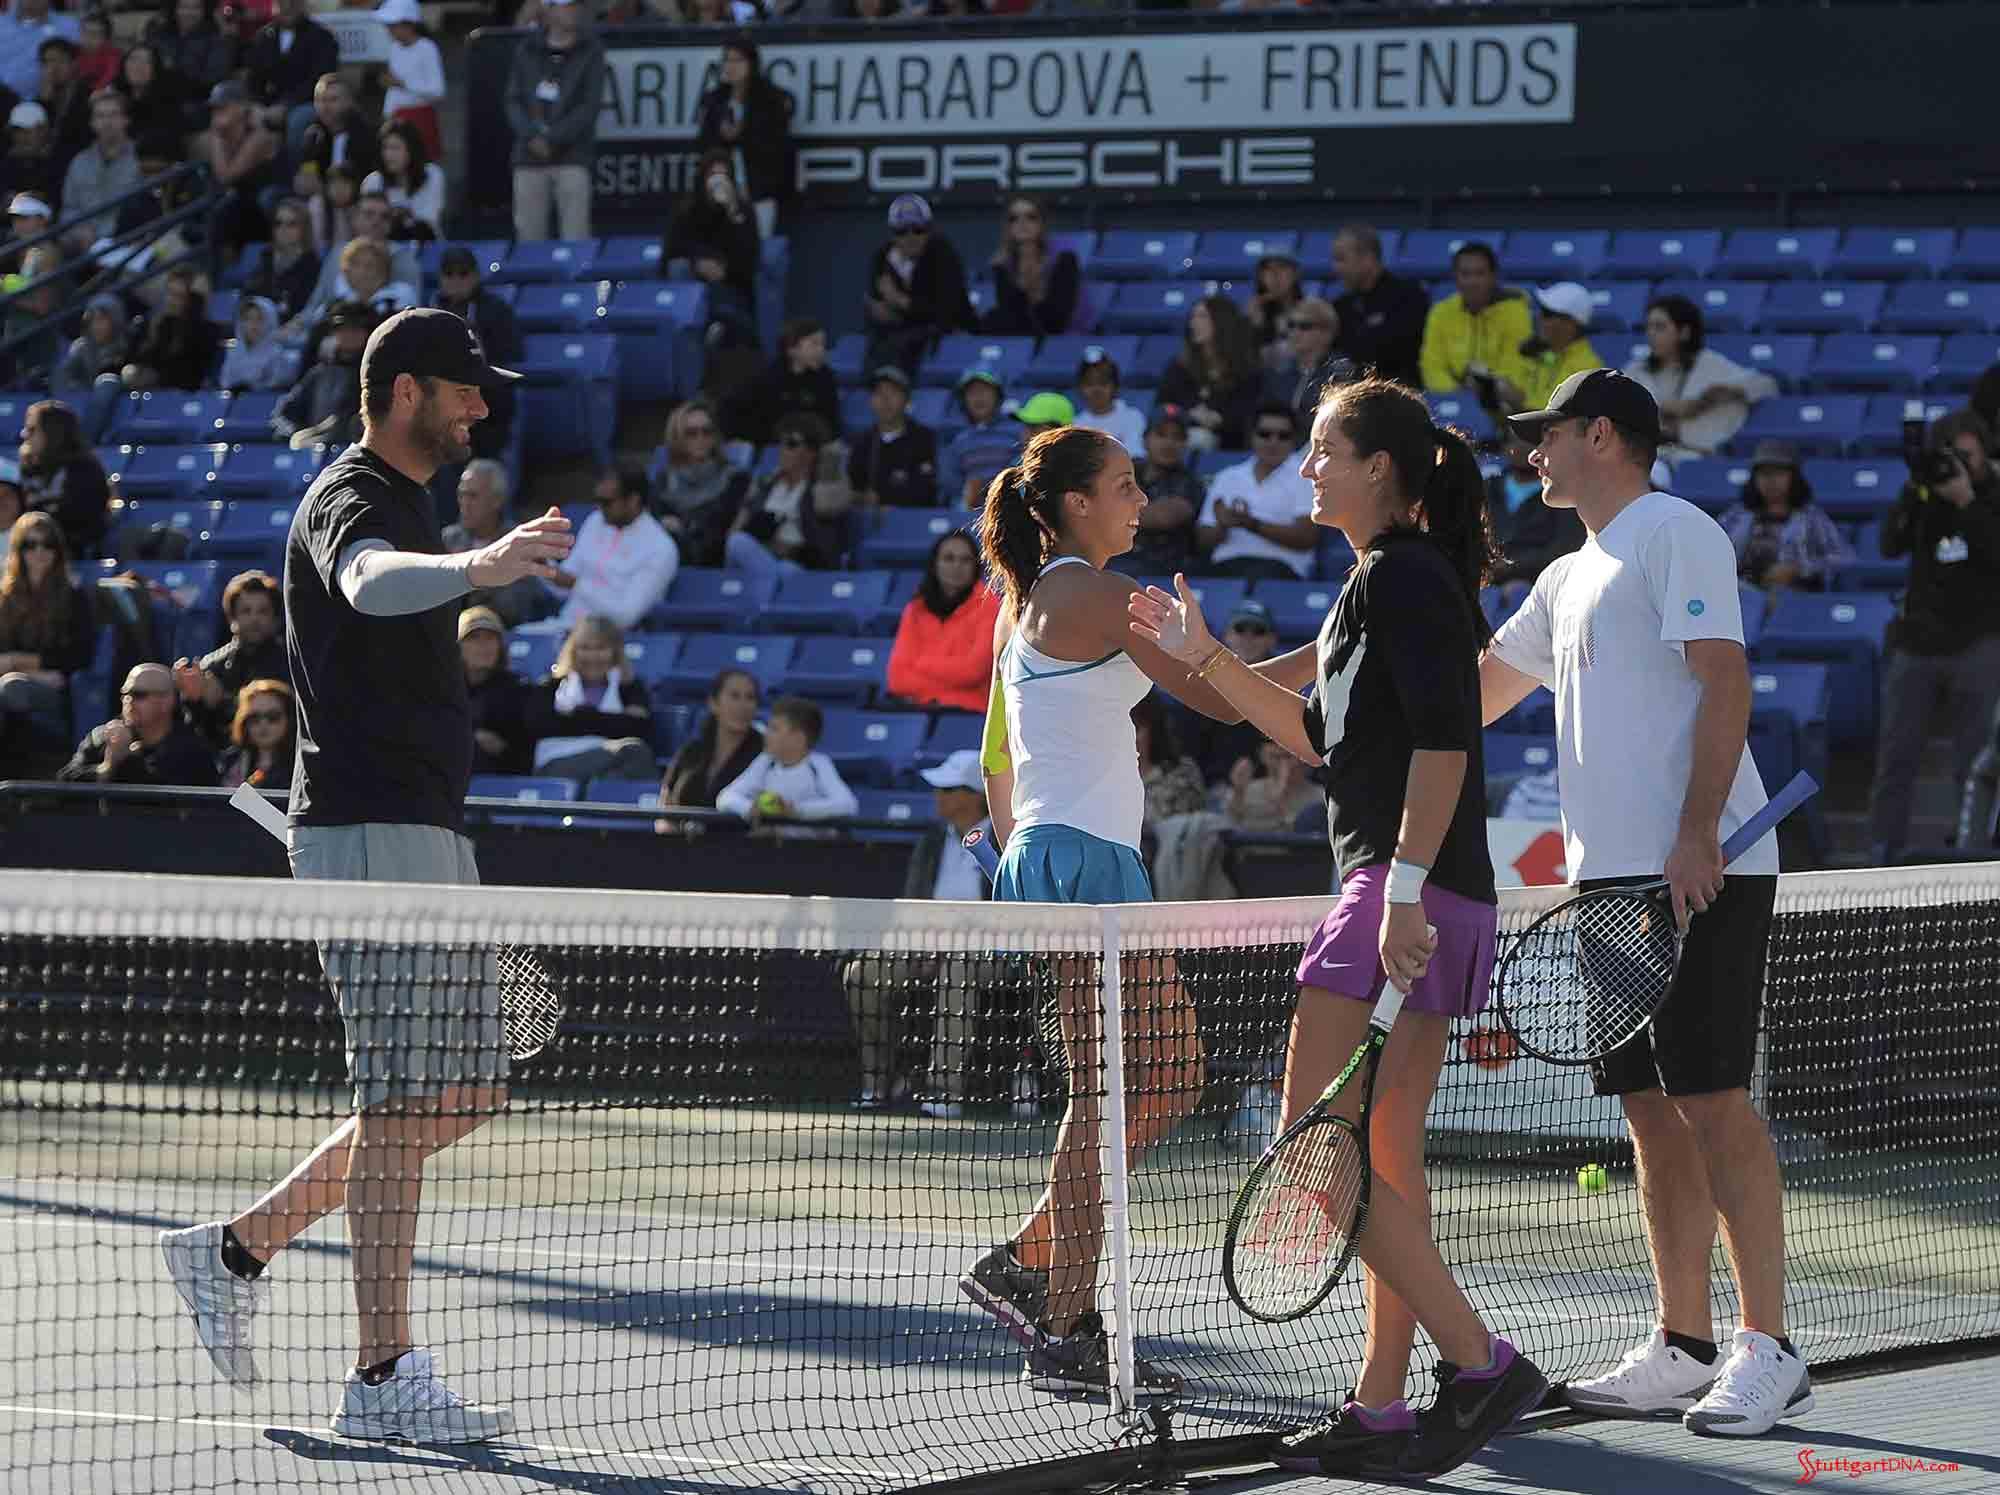 Maria Sharapova and Friends 2015 LA Event: Fish, Keys, Robson and Roddick on UCLA Tennis Center Court. Credit: Porsche AG